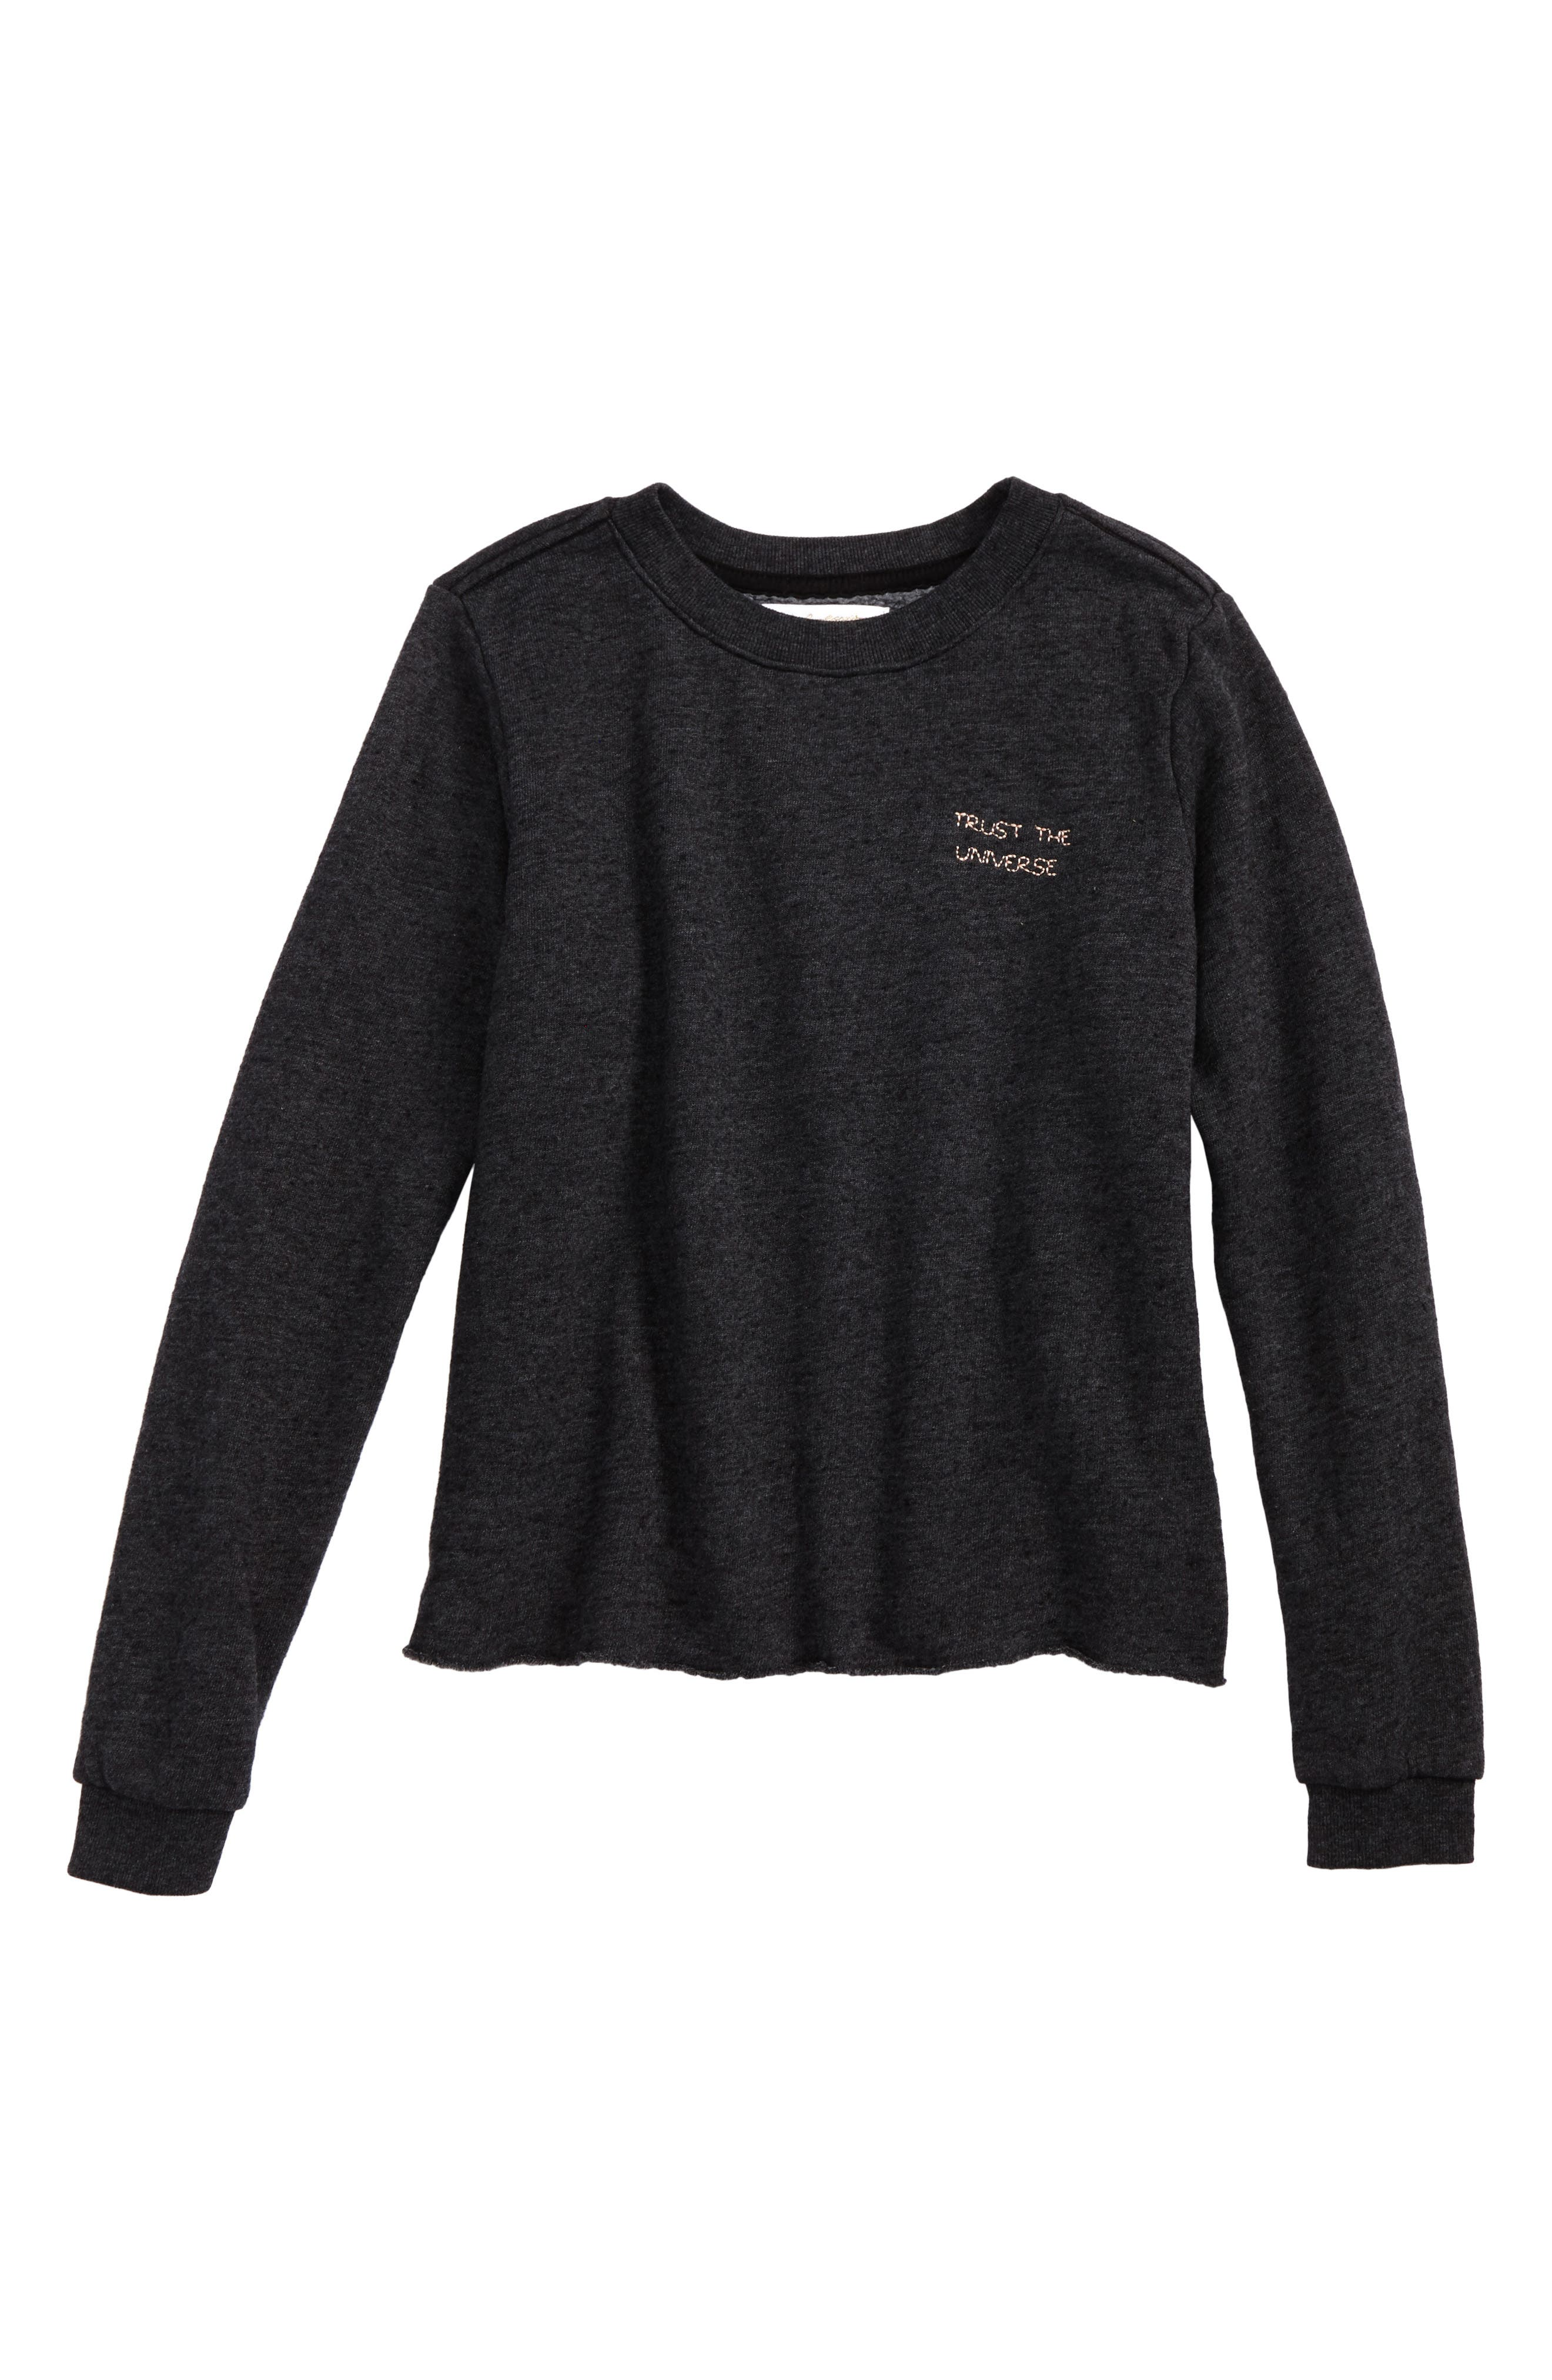 Trust the Universe Crop Sweatshirt,                         Main,                         color, 003